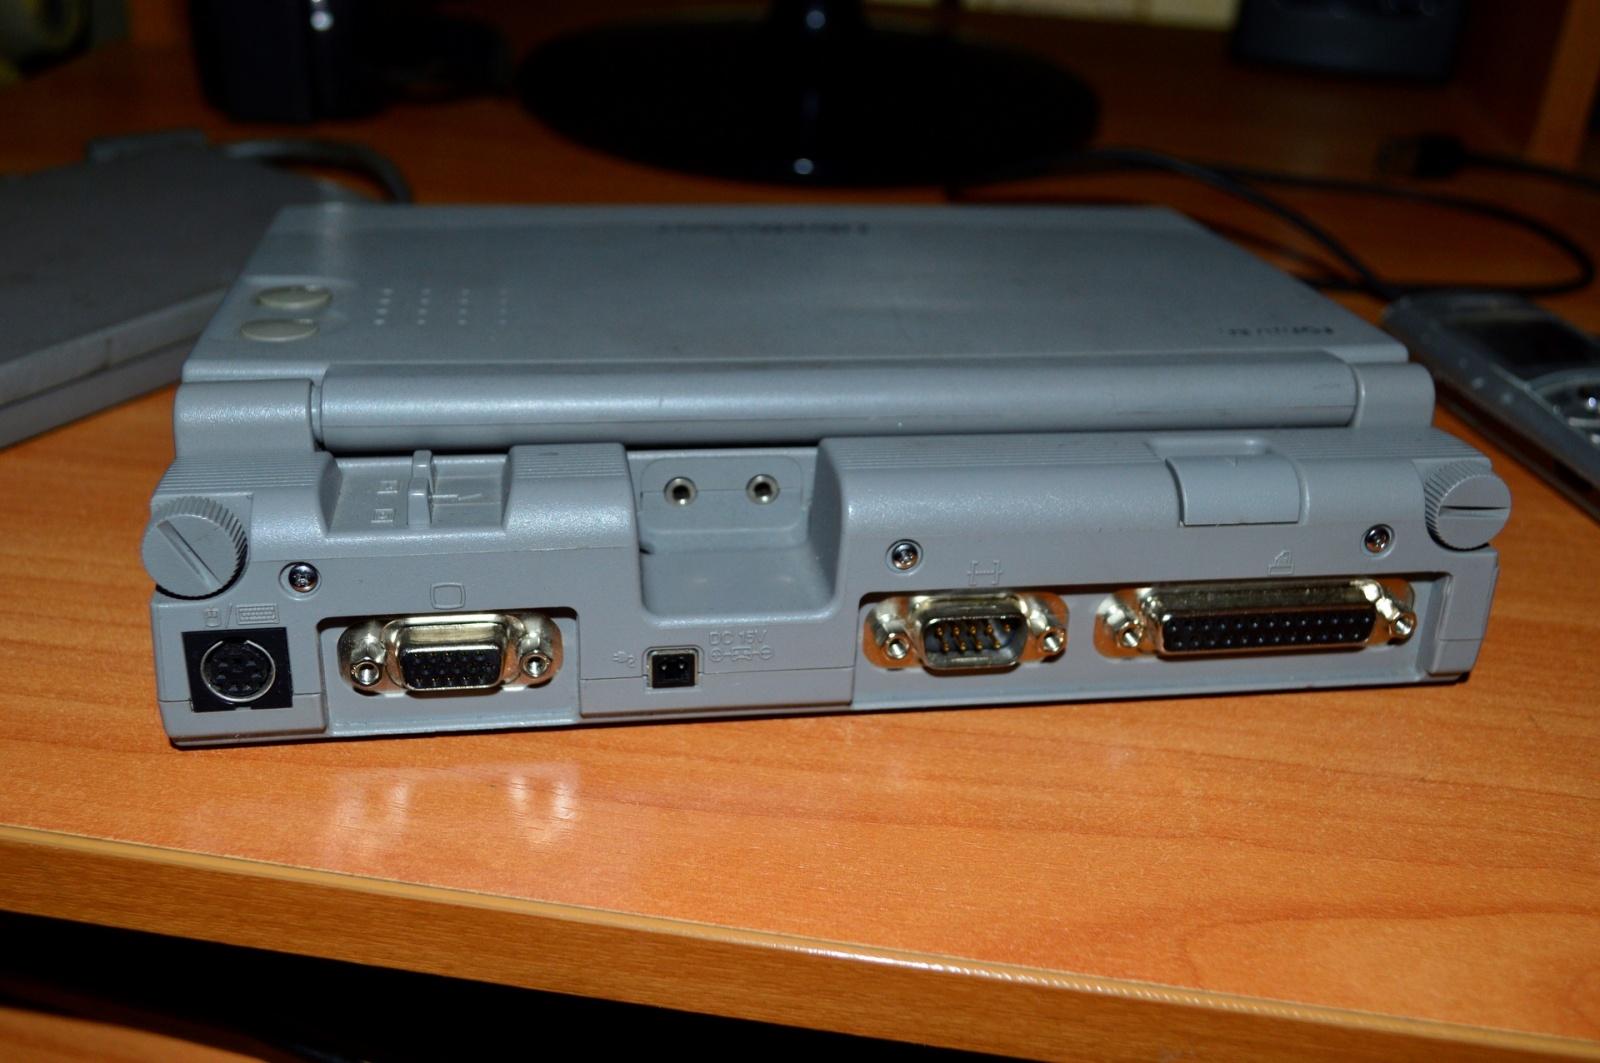 Какими были ноутбуки 20 лет назад на примере Toshiba libretto 100ct - 10